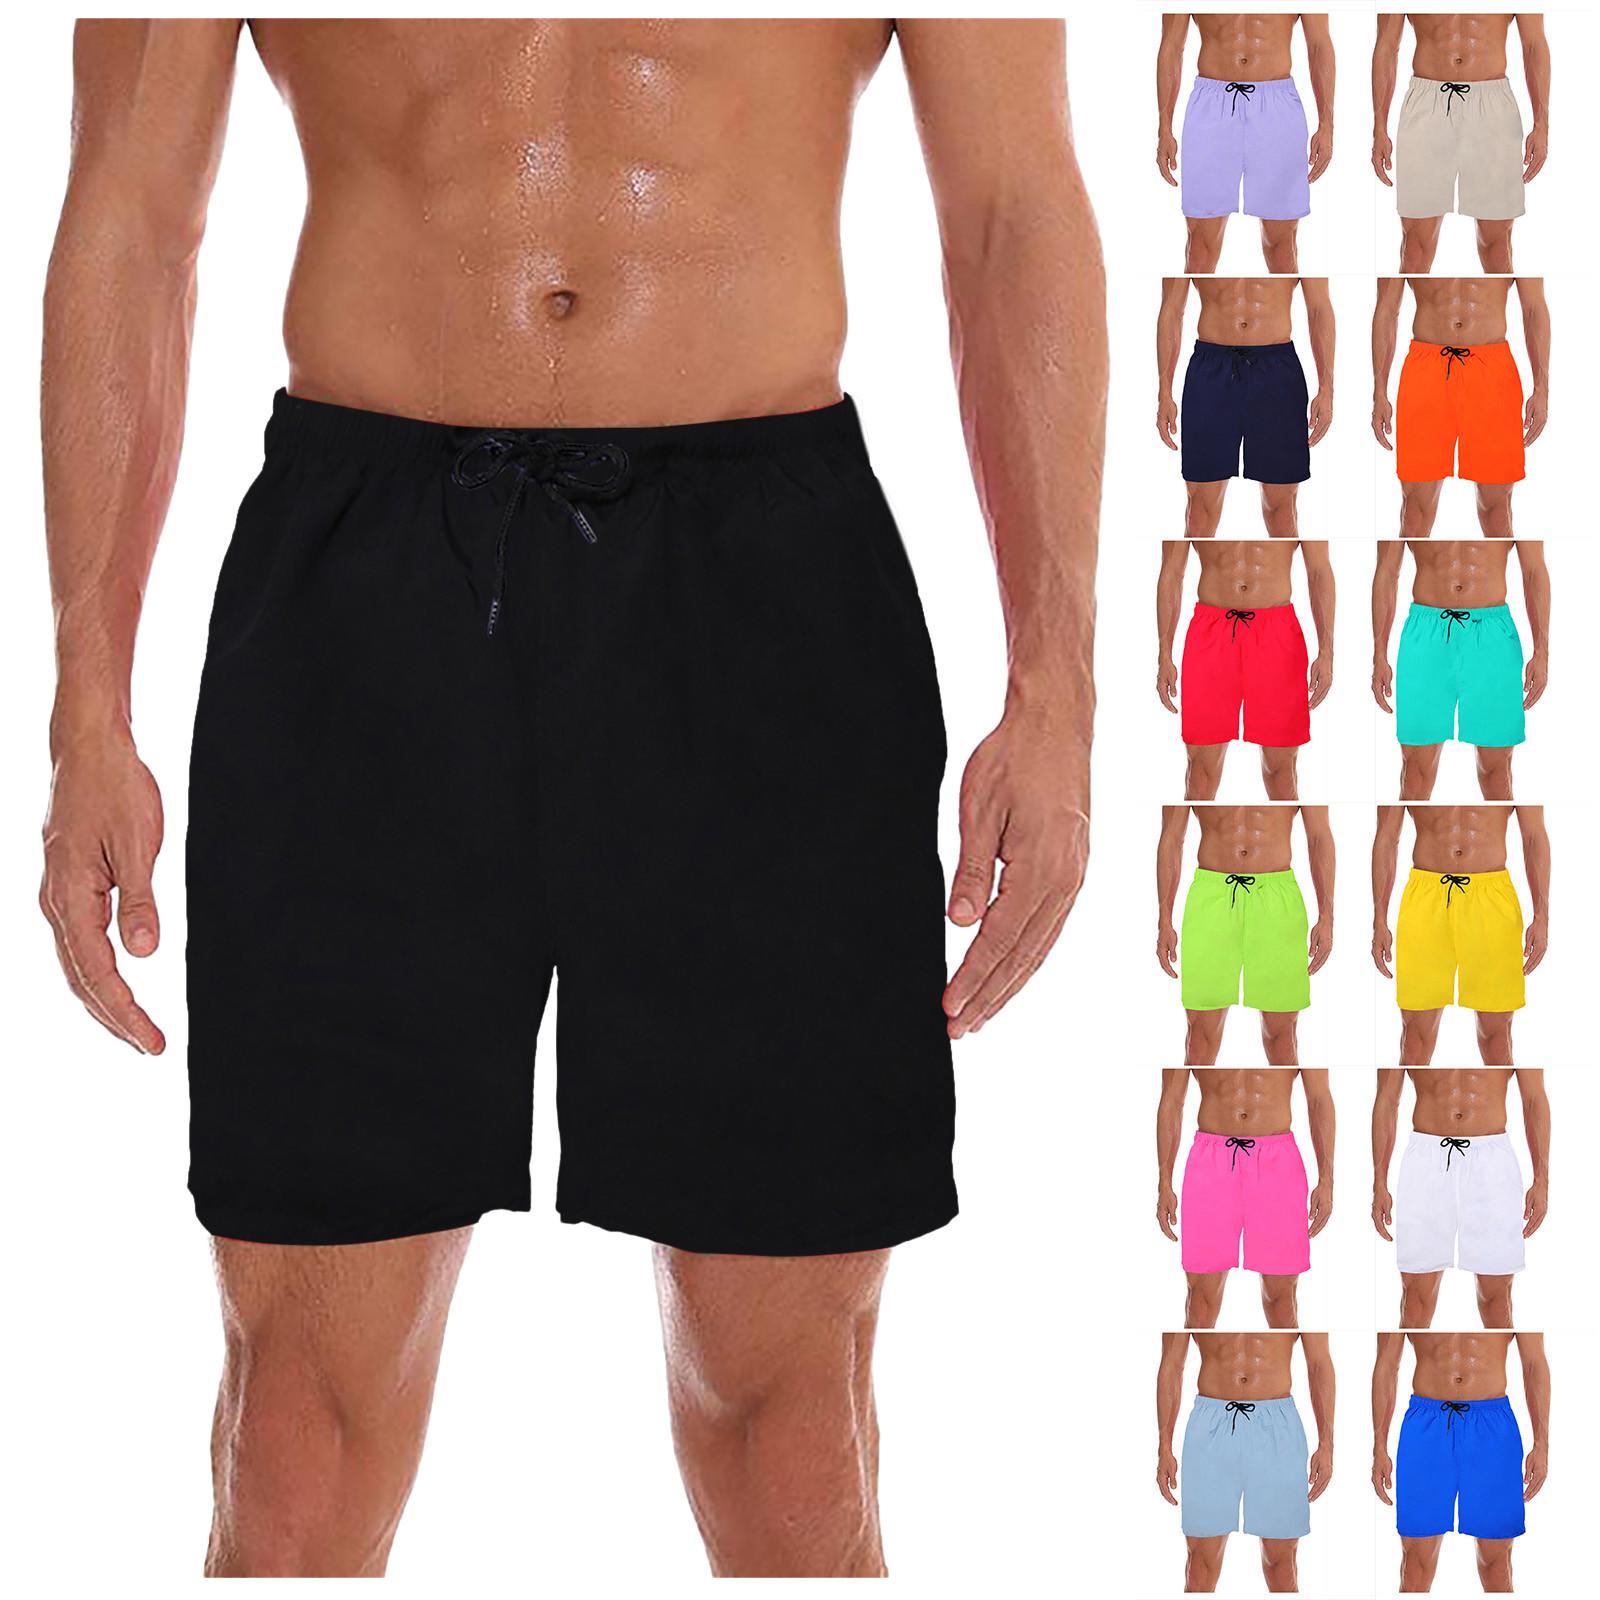 Men Beach Shorts Quick Dry Waterproof Swimming Short Trunks 2021 Low Waist Surf Swimsuit Swimwear Shorts Quick Dry